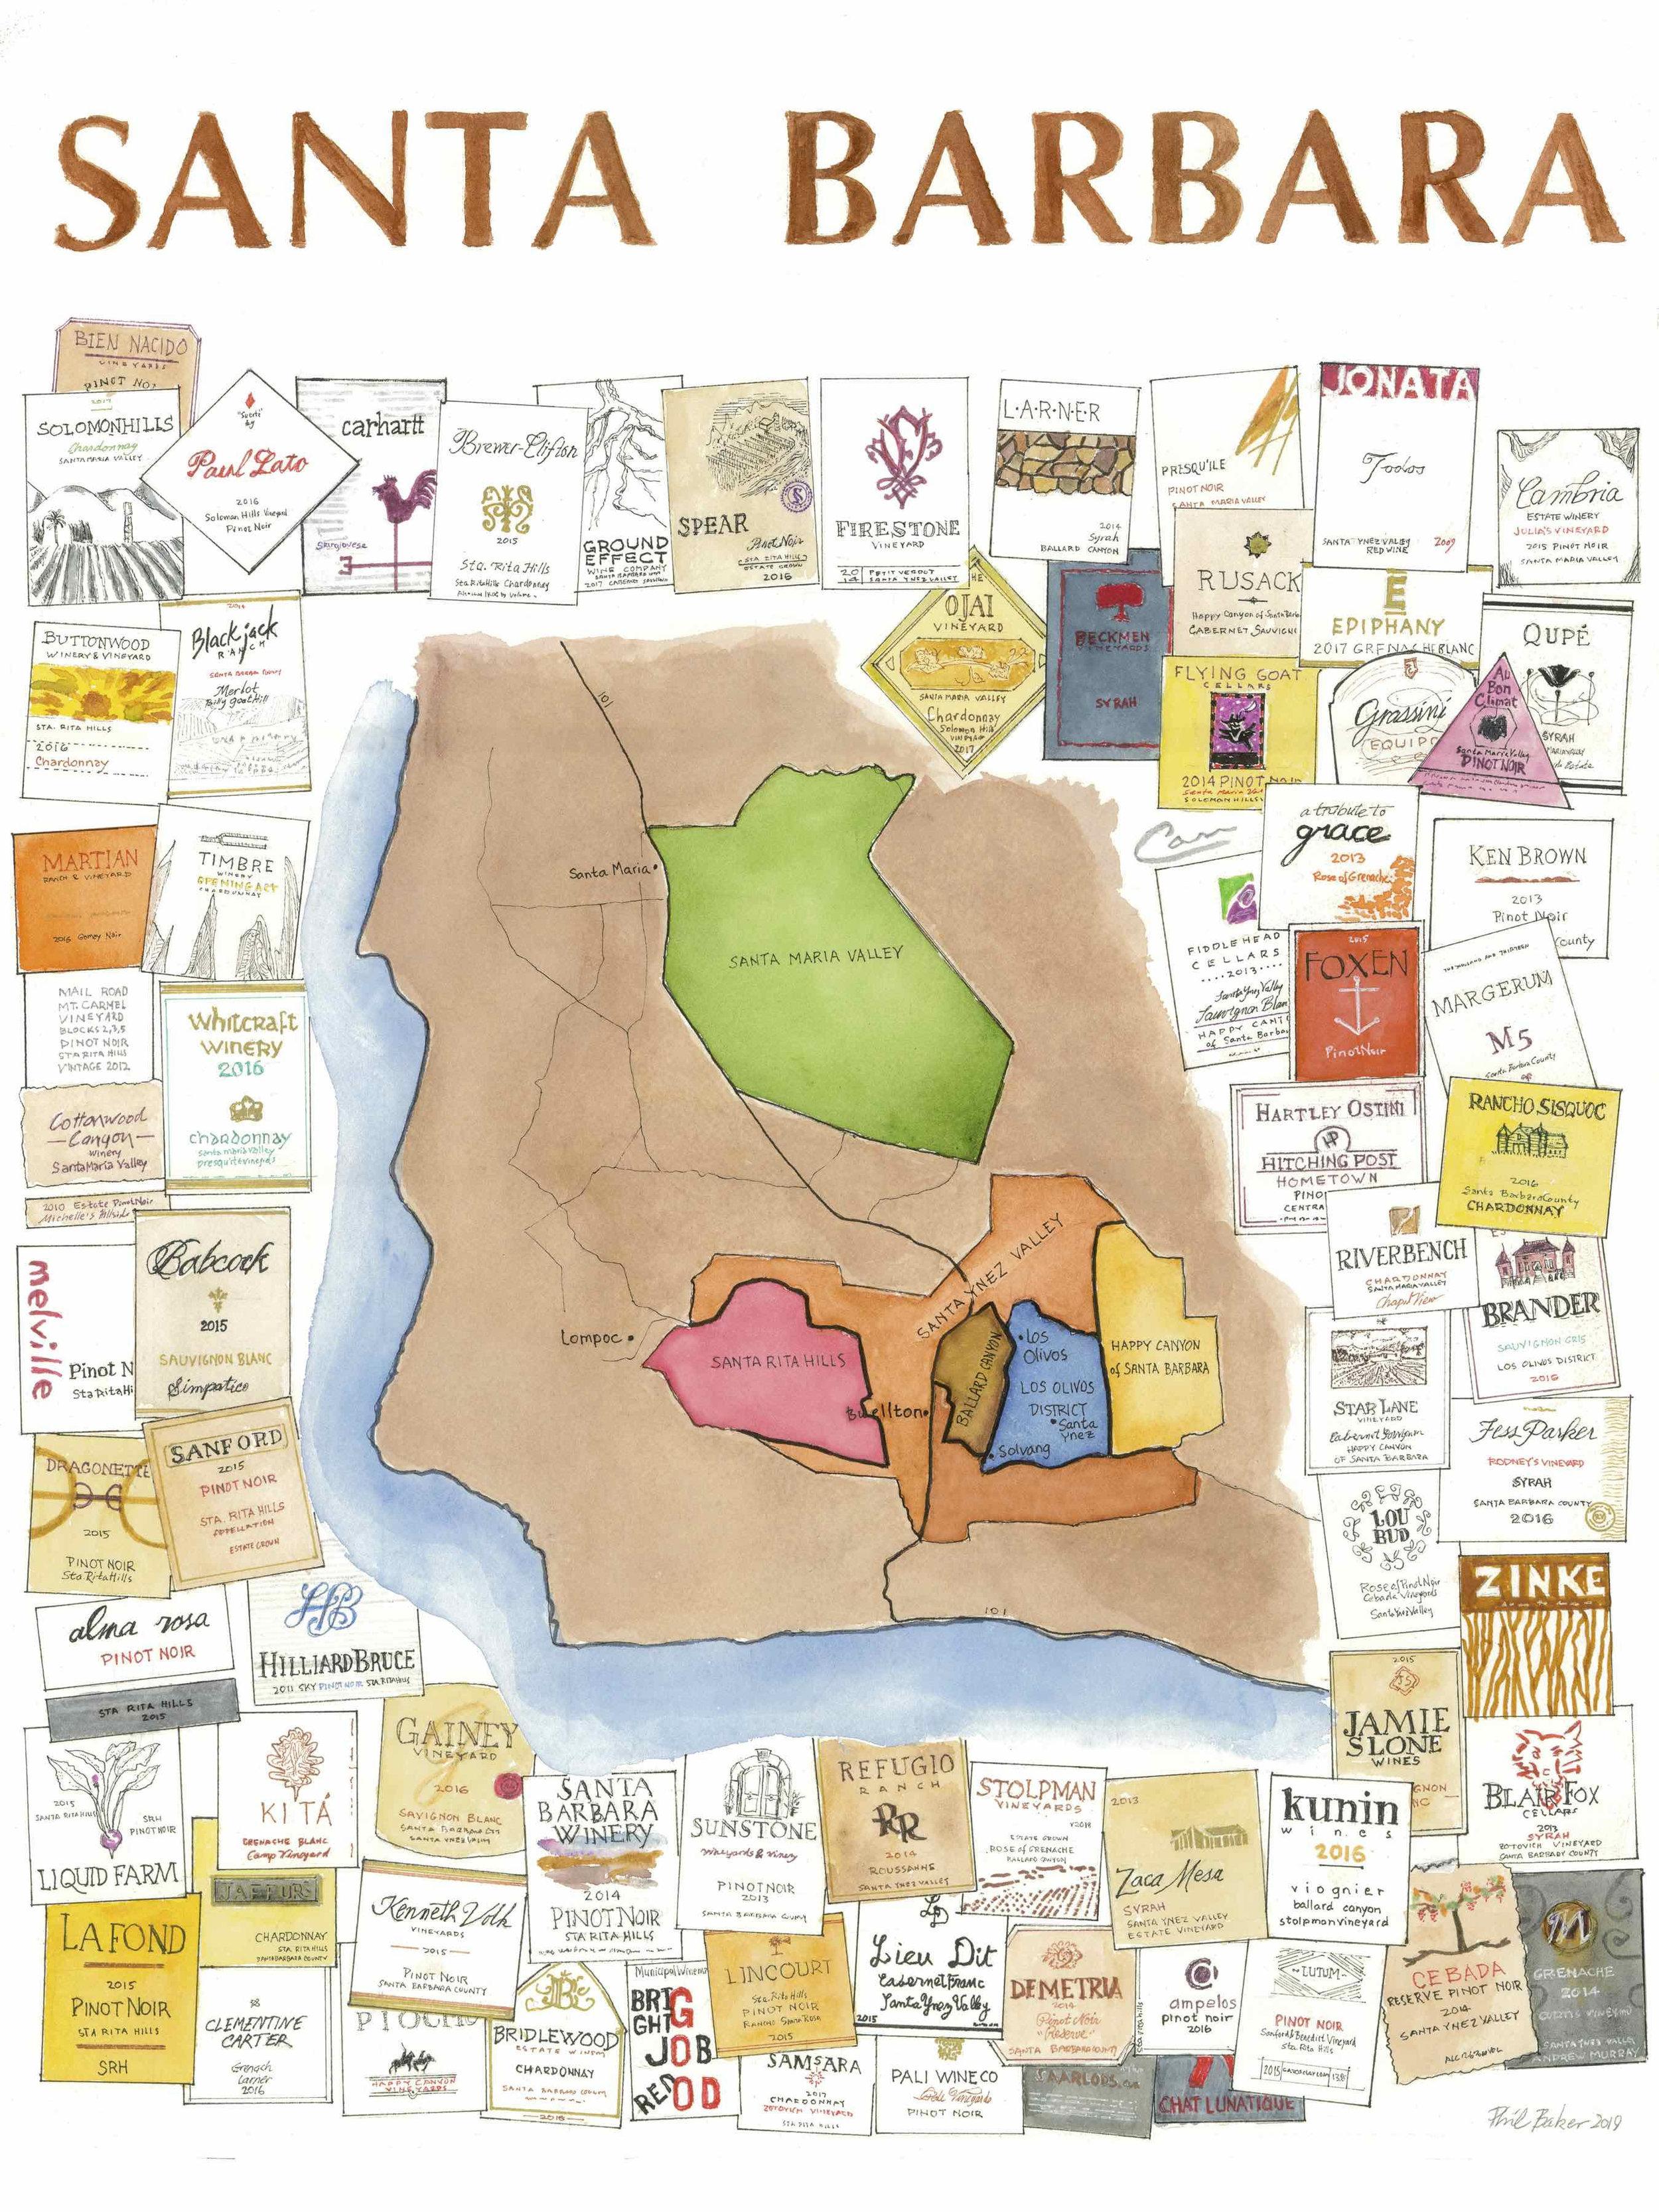 Santa Barbara Wine Map - $35 - 18